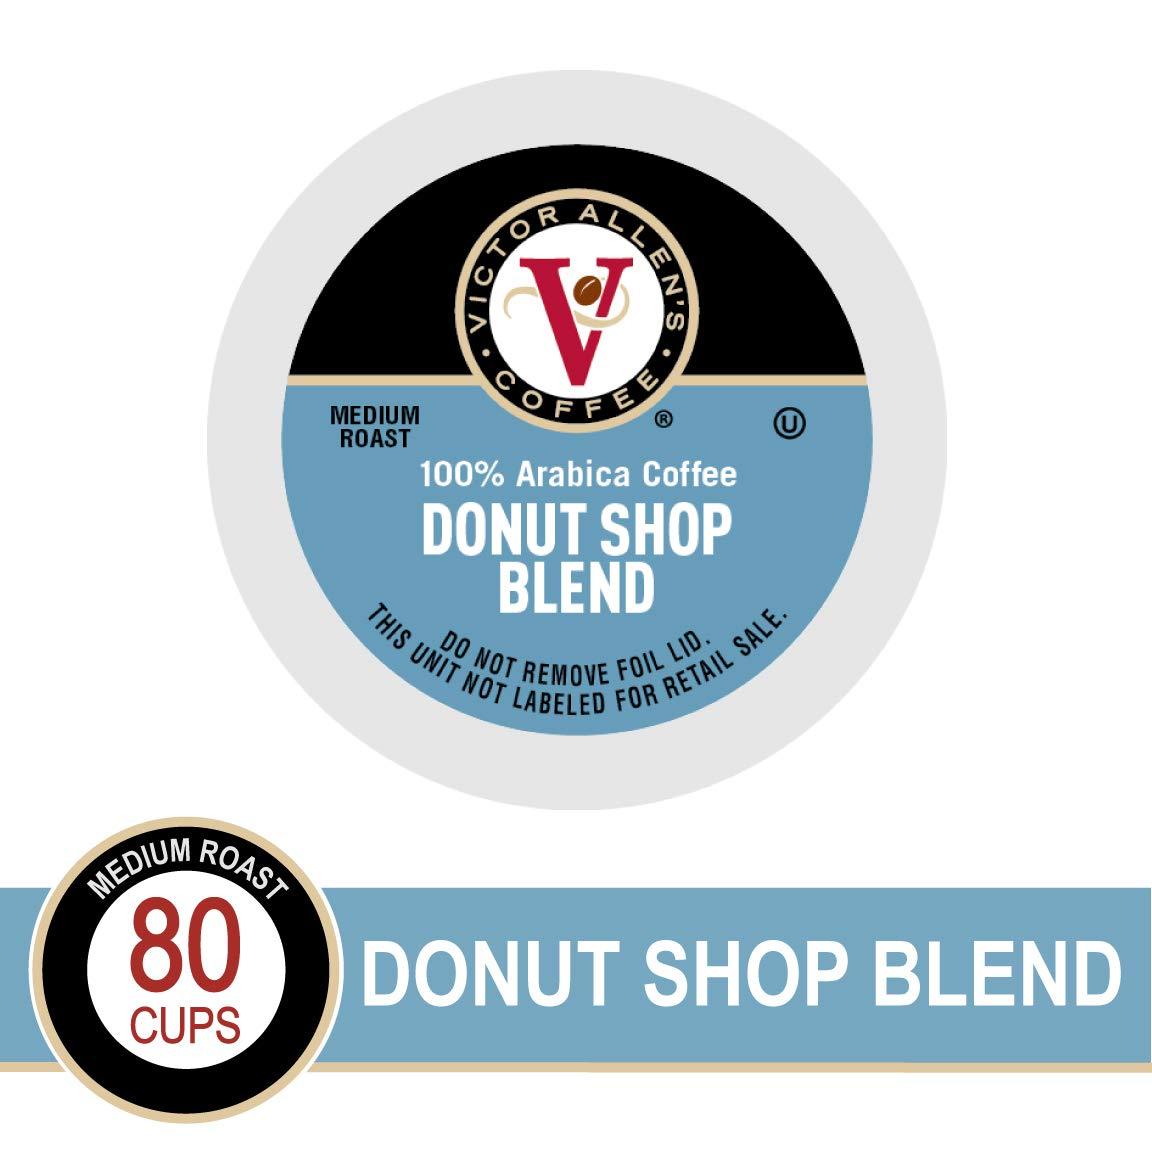 Donut Shop Blend for K-Cup Keurig 2.0 Brewers, 80 Count, Victor Allen's Coffee Medium Roast Single Serve Coffee Pods by Victor Allen